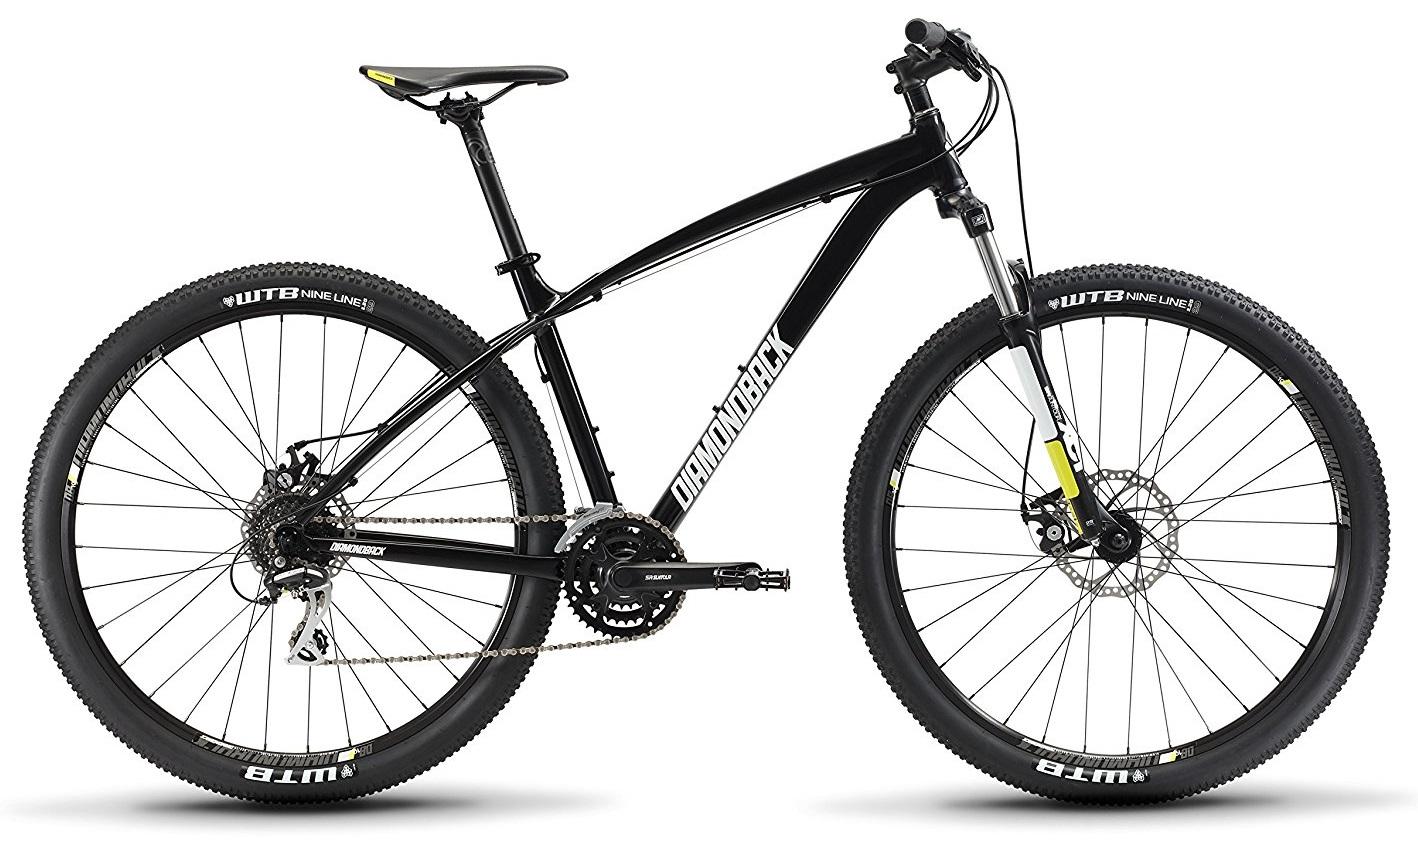 Diamondback Bicycles Overdrive 29er Complete READY RIDE Hardtail Mountain Bike